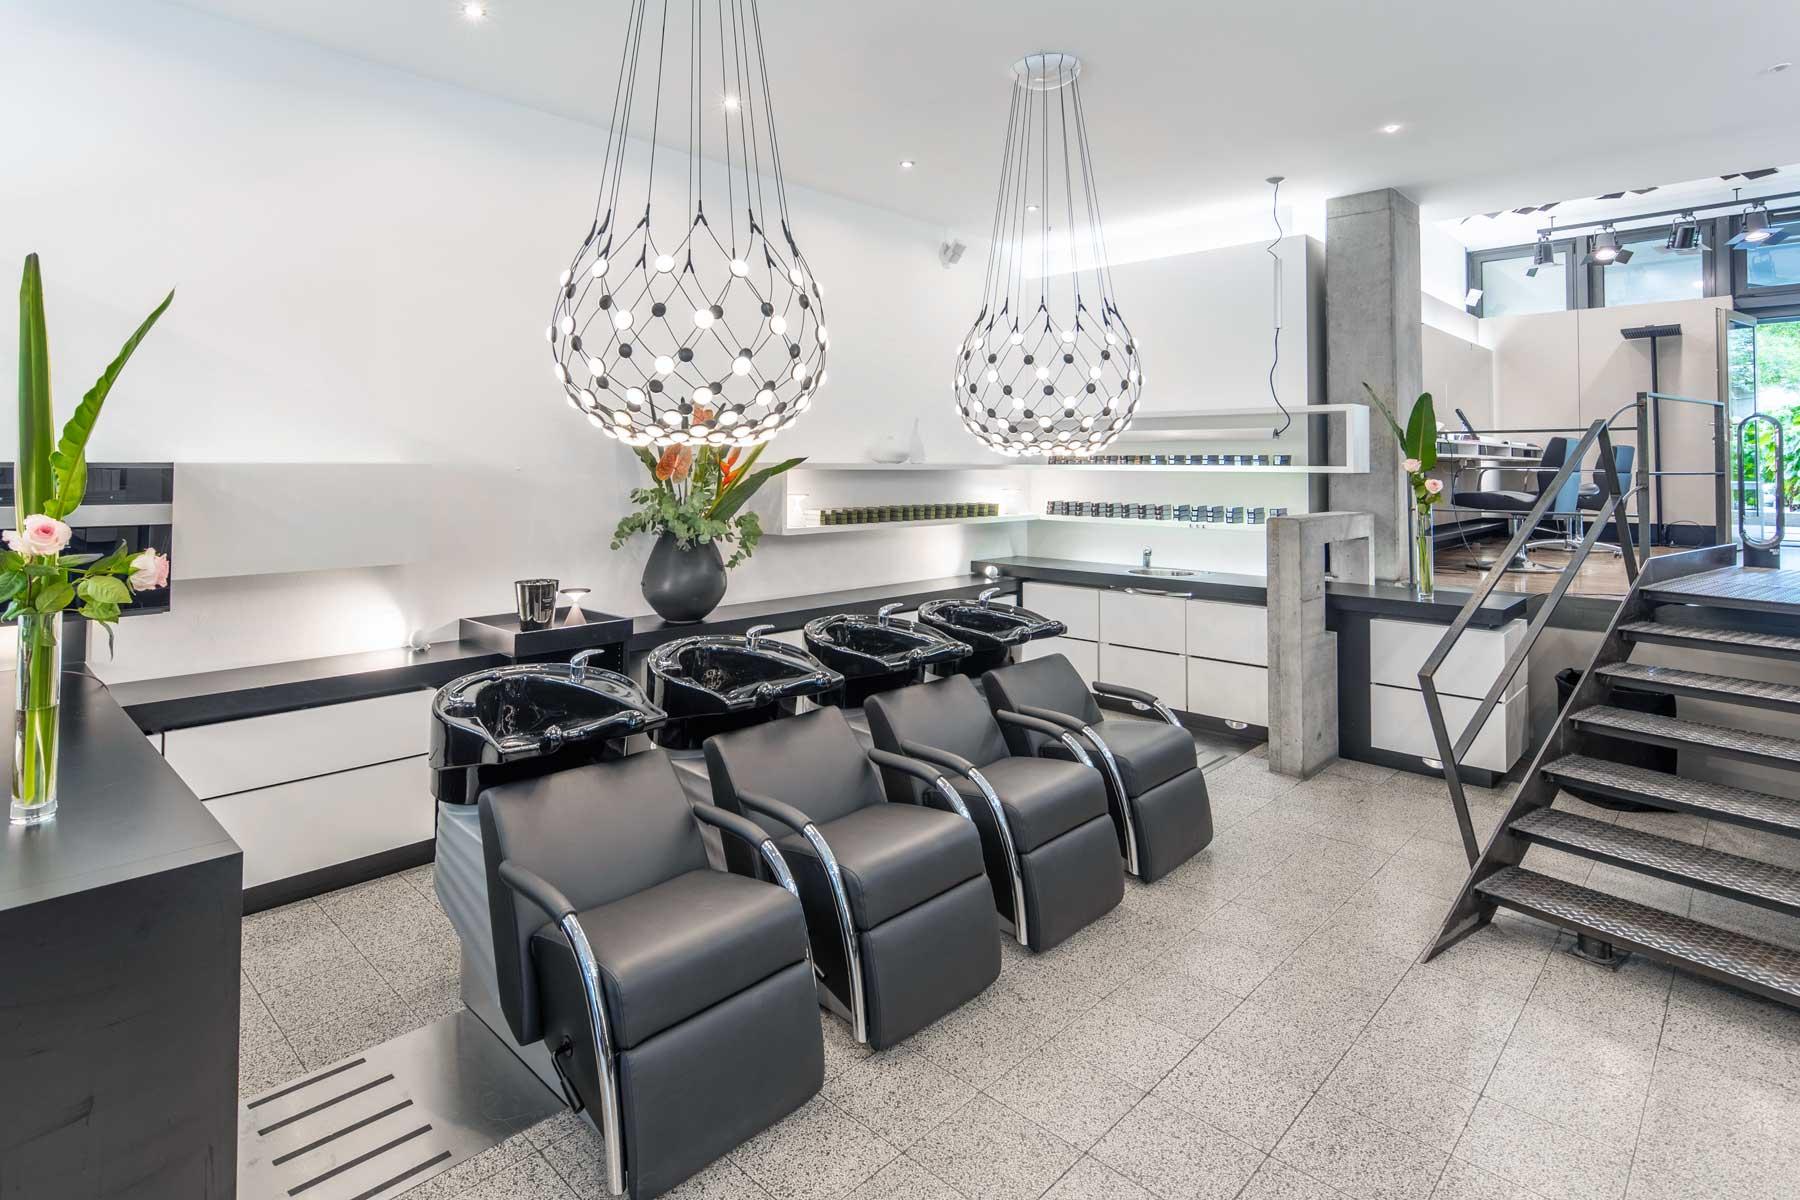 Klassik fuer Haare - Friseursalon Stuttgart - Waschliegen links